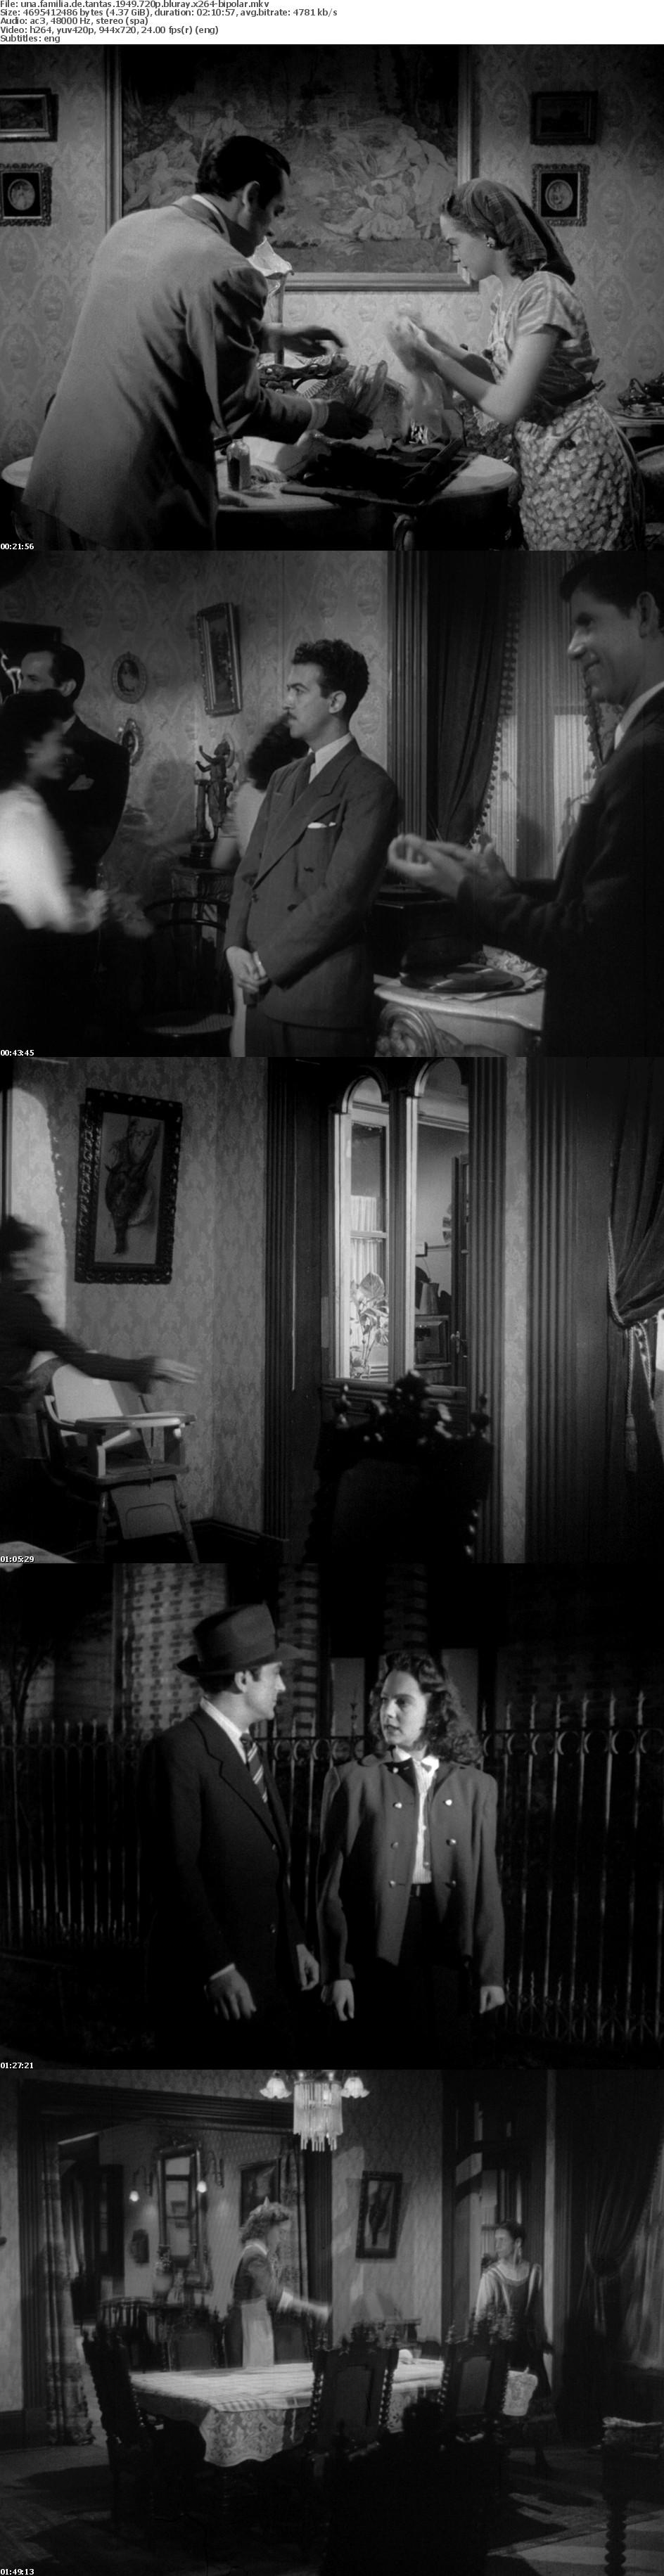 Una Familia de Tantas 1949 720p BluRay x264-BiPOLAR